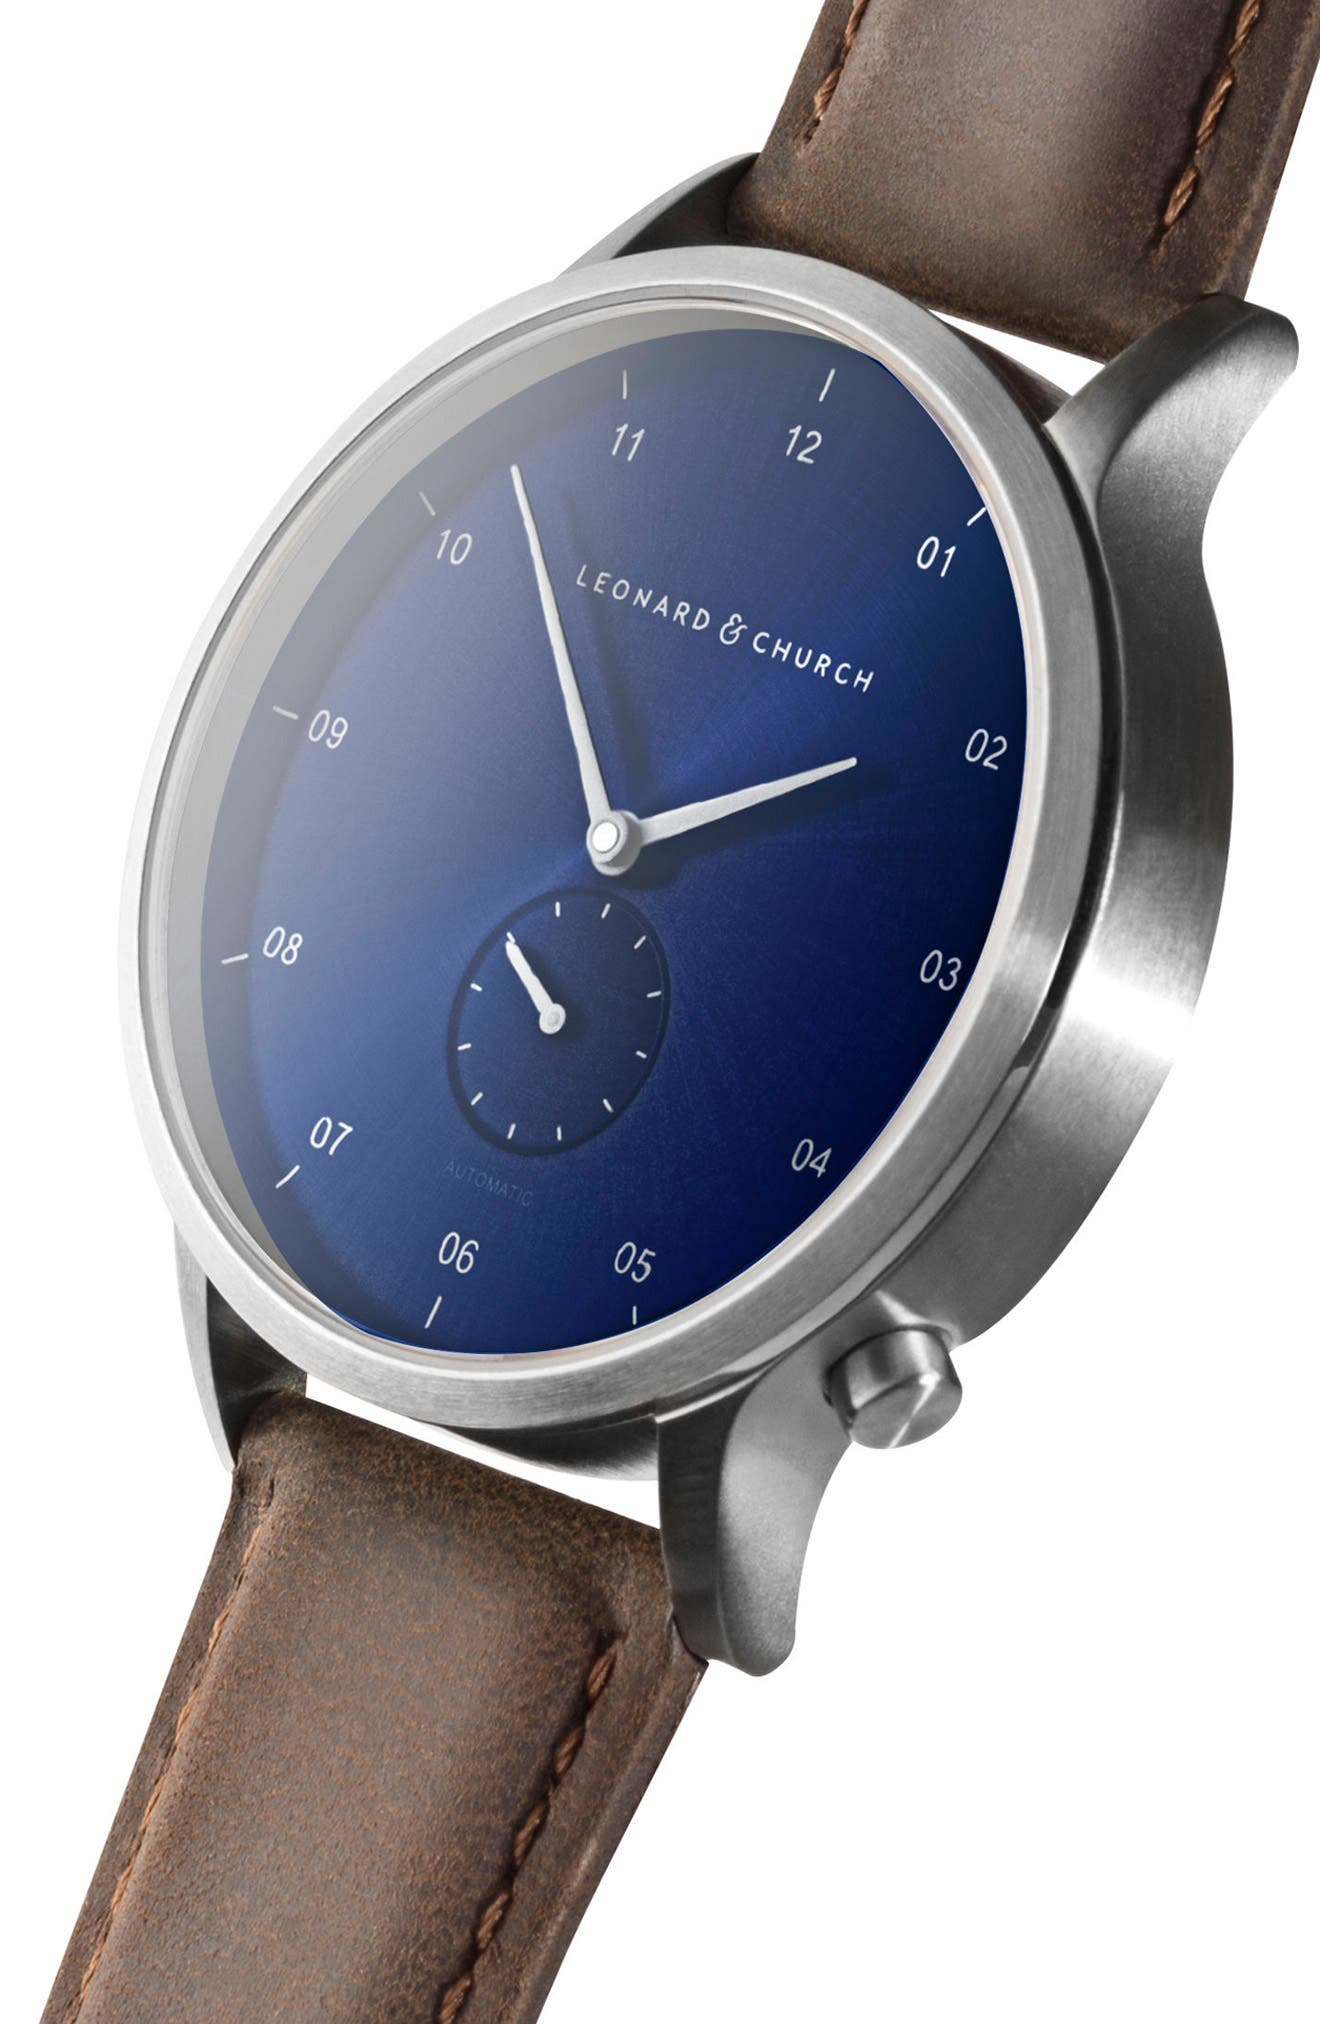 Leonard & Church Sullivan Automatic Suede Strap Watch, 39mm,                             Alternate thumbnail 5, color,                             Dark Brown/ Blue/ Silver